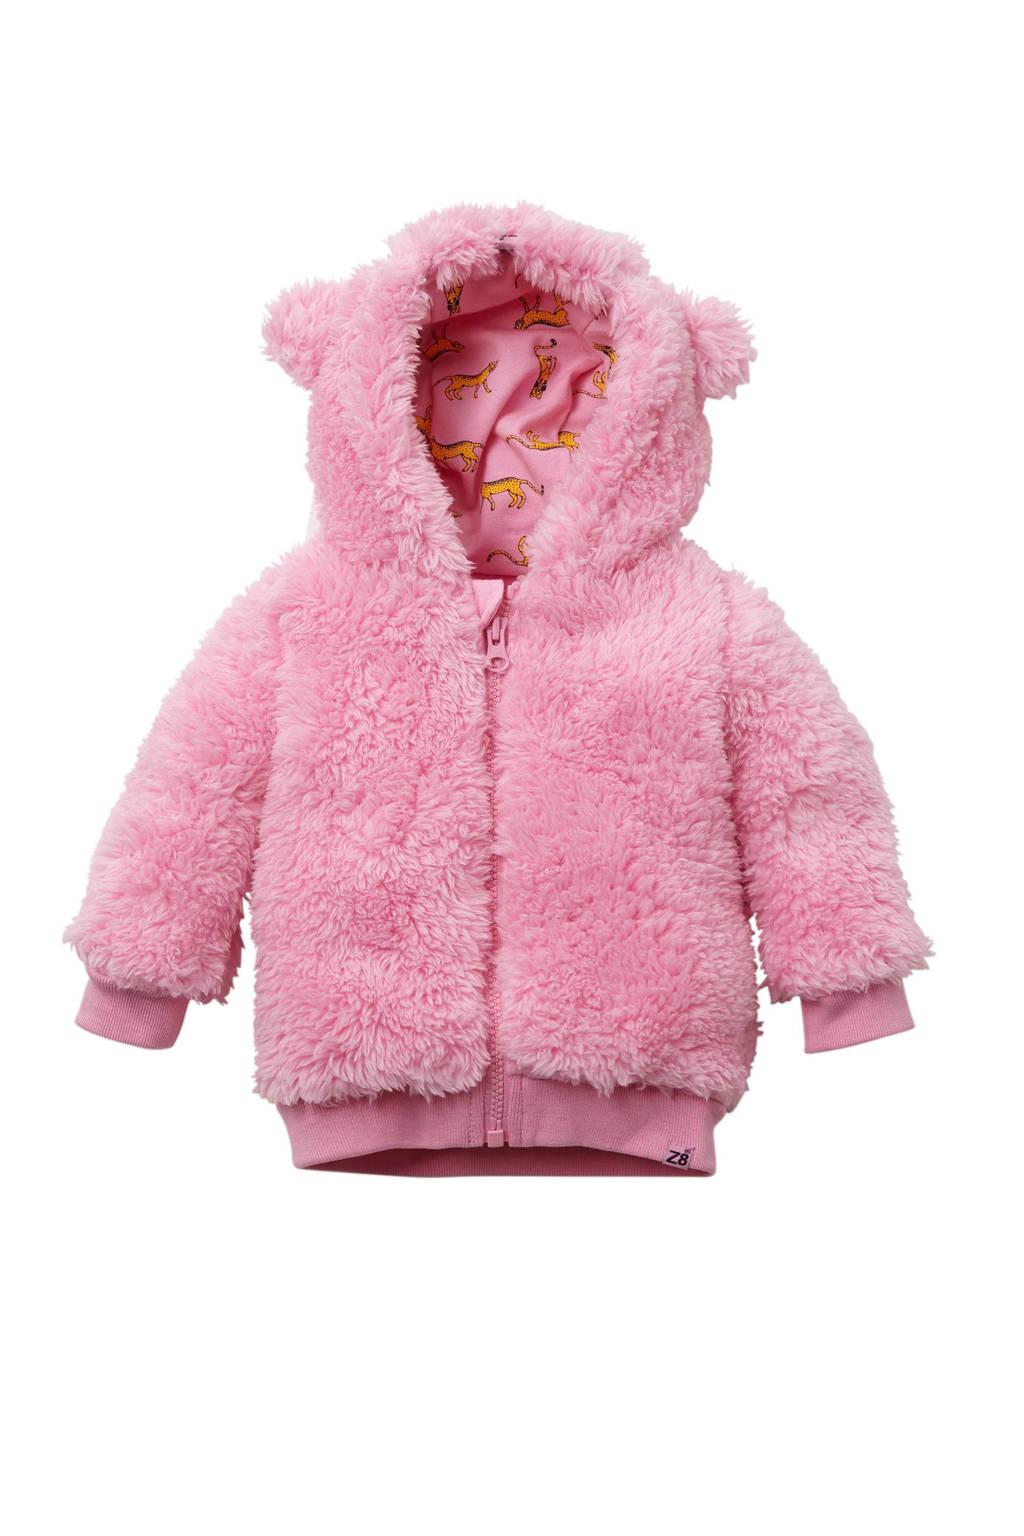 Z8 newborn baby vest Polaris, Roze